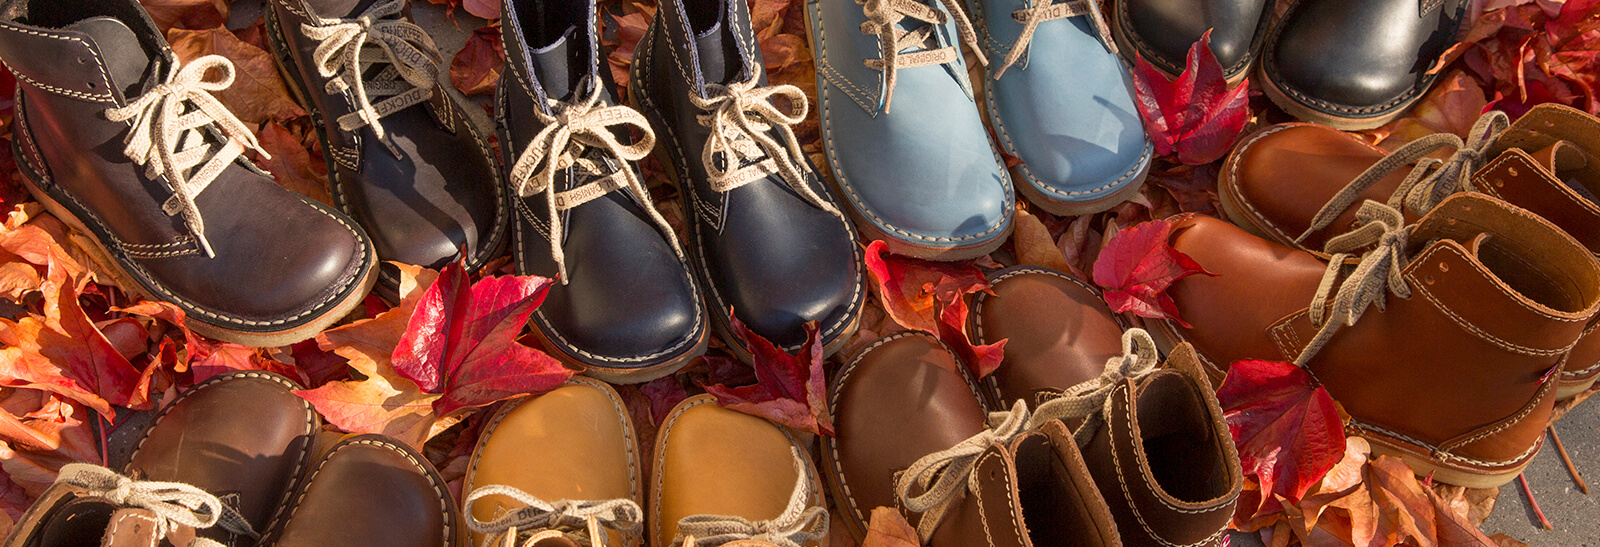 Shop for Bugatti   Boots   Footwear